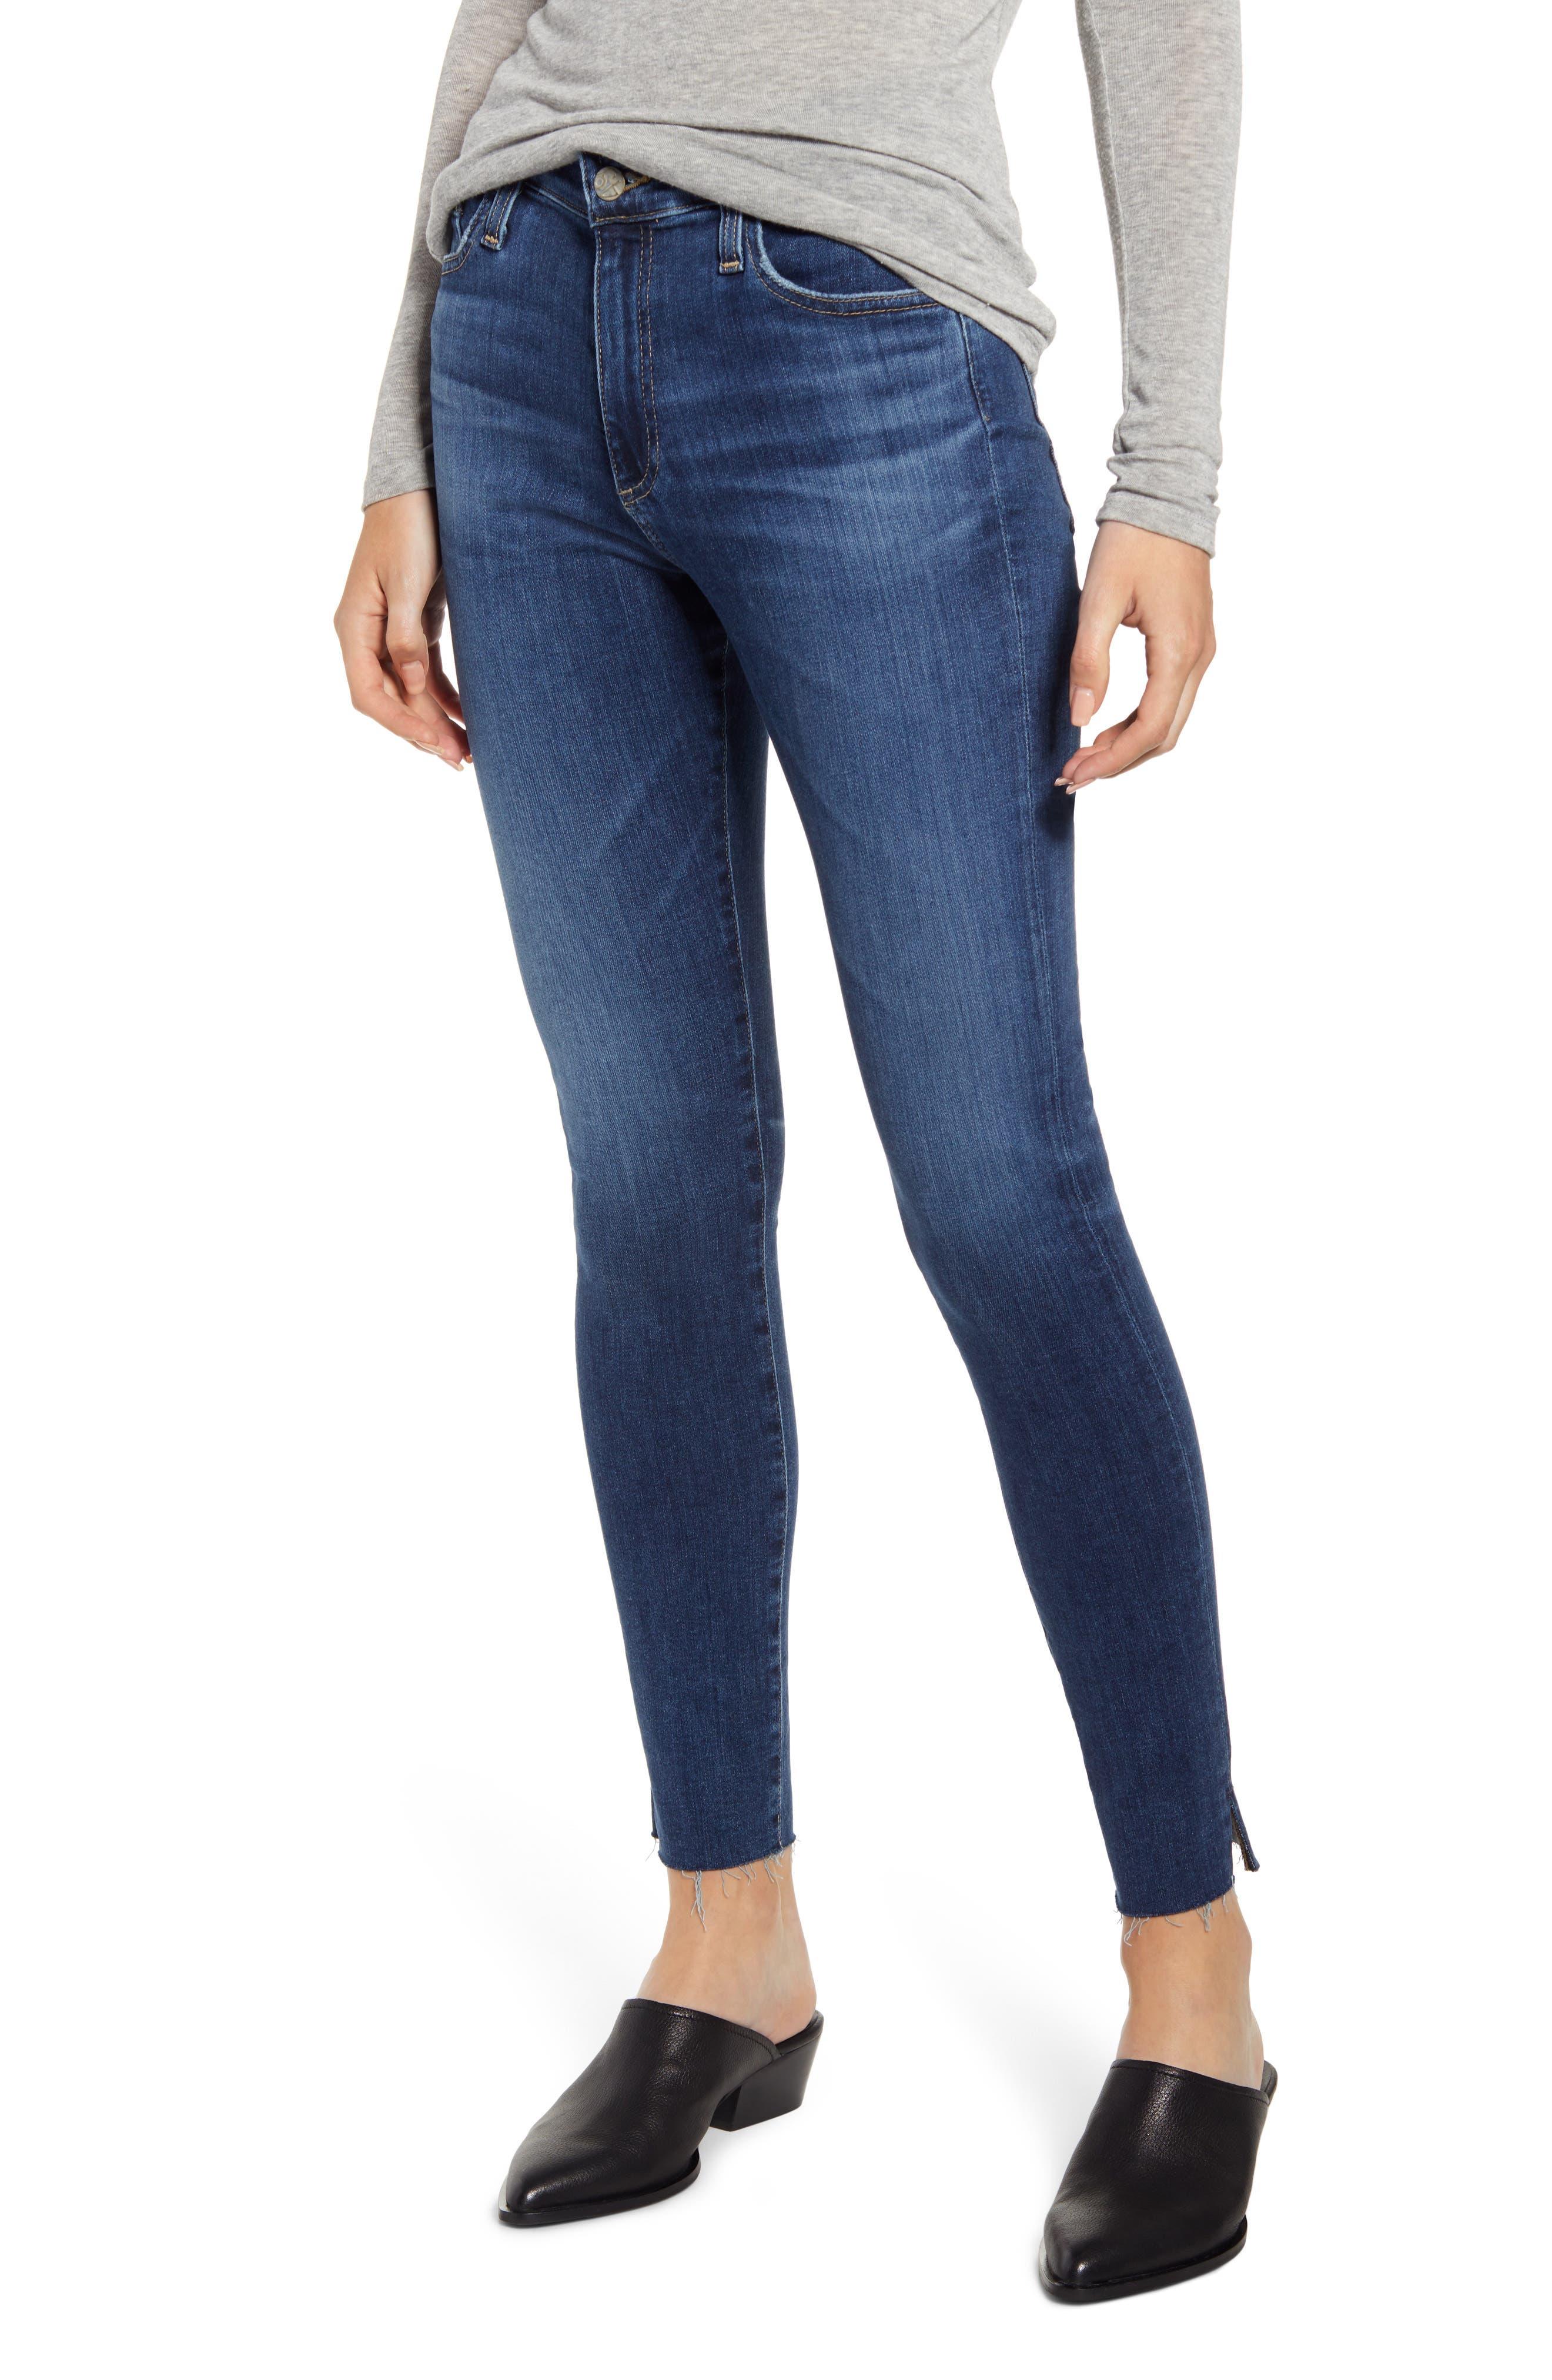 AG The Farrah High Waist Ankle Skinny Jeans (11 Years Blue Bound)